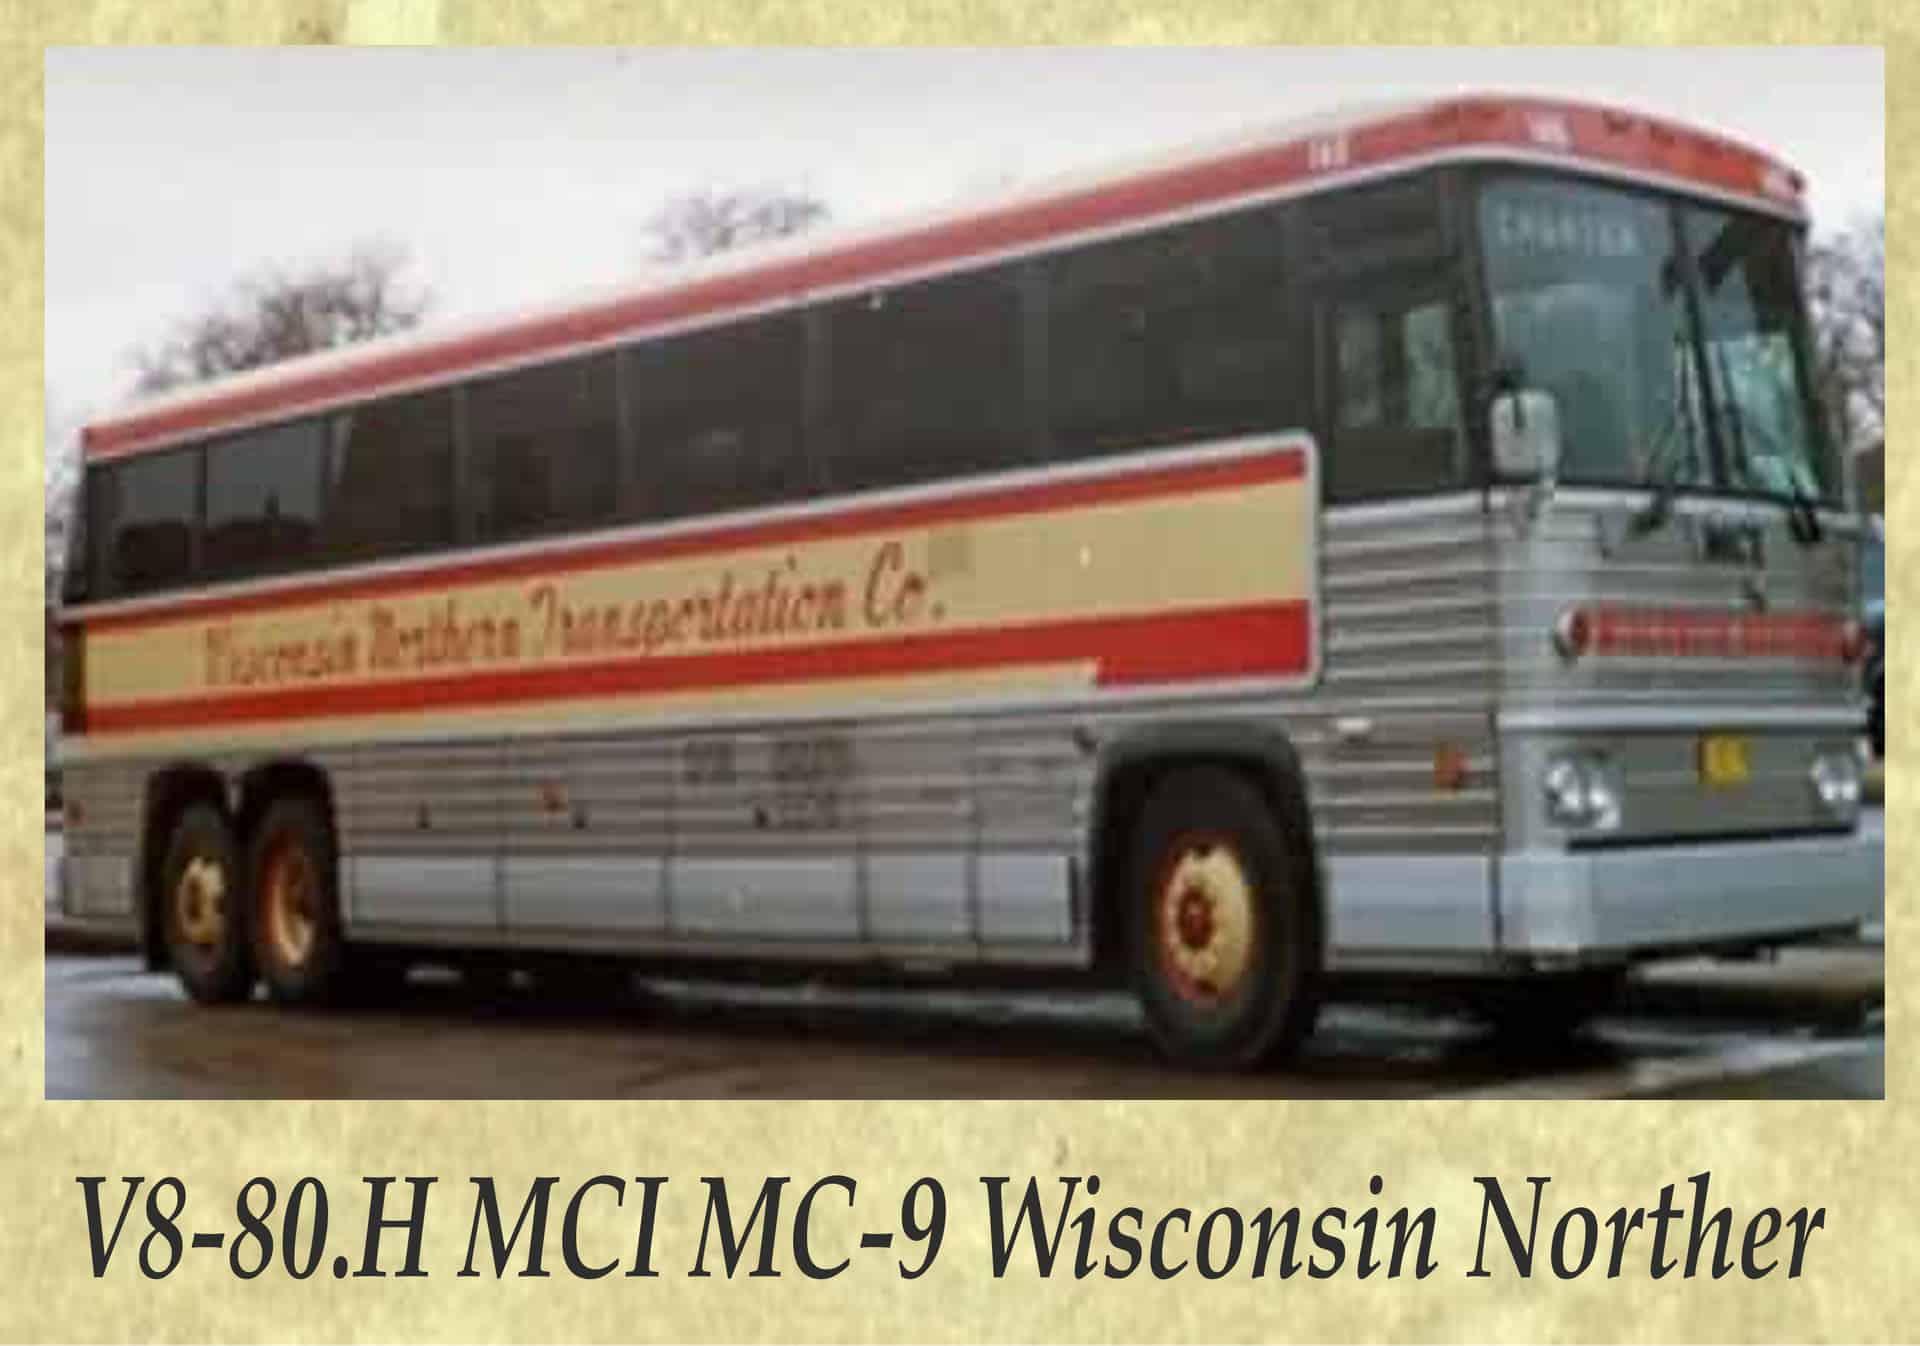 V8-80.H MCI MC-9 Wisconsin Norther